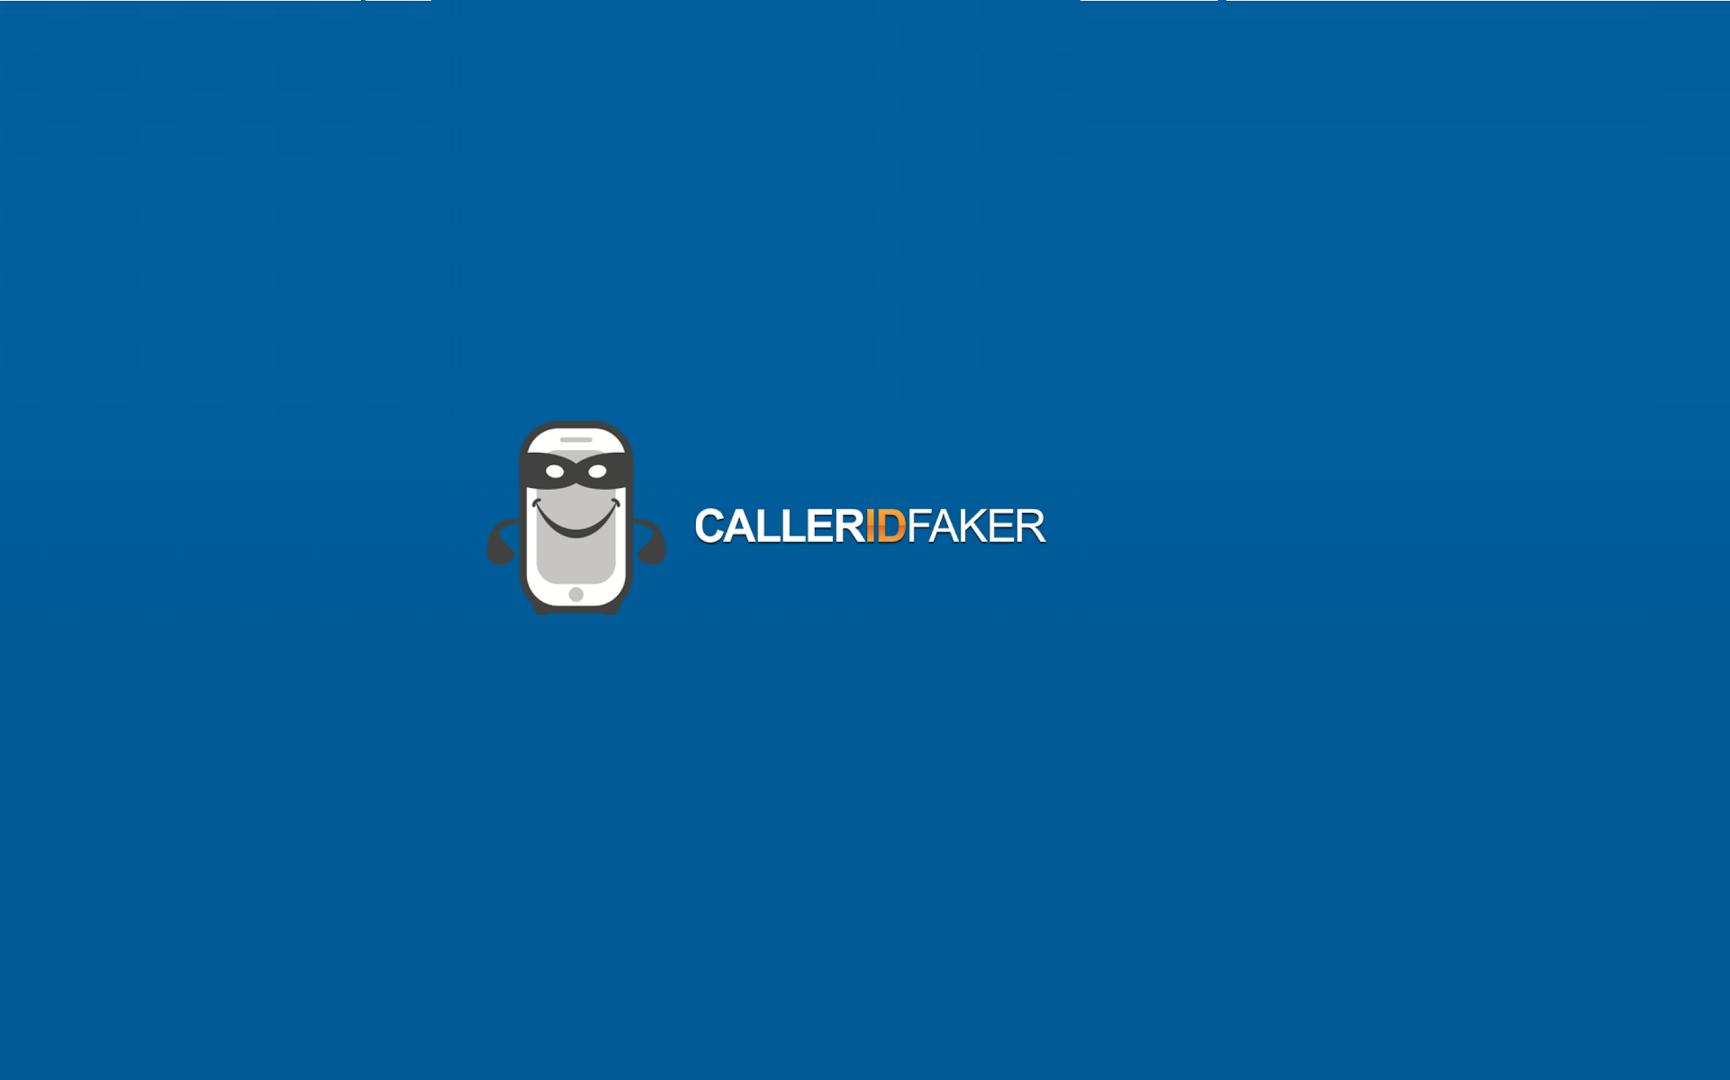 Caller ID Faker & Recorder App - Revenue & Download estimates